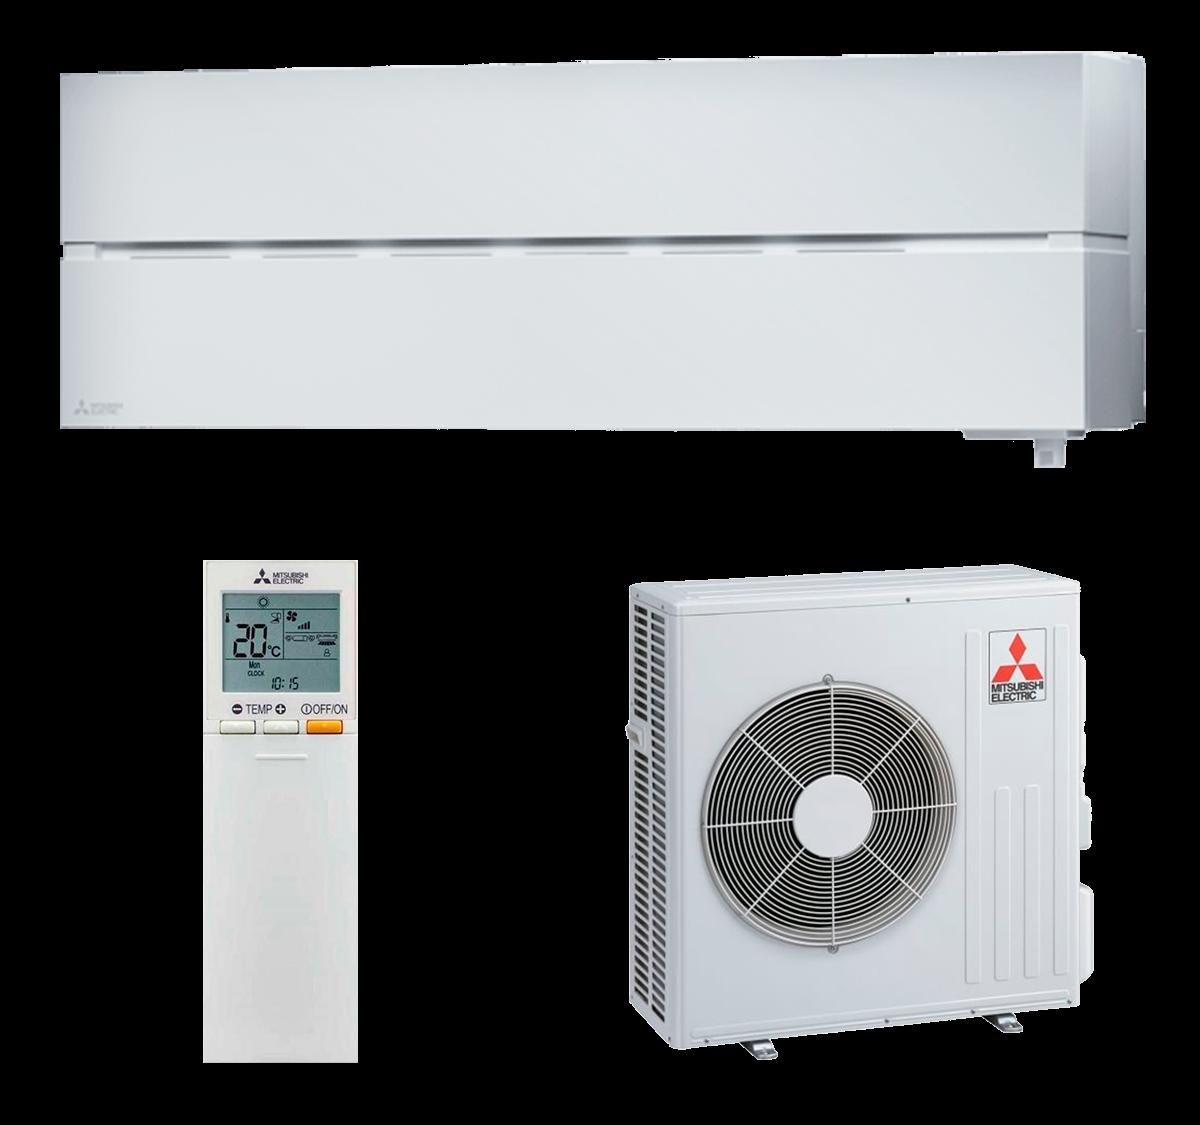 aire acondicionado split blanco mitsubishi electric inverter serie kirigamine style modelo msz ln60vgw precio incluido instalacion caseragua 03